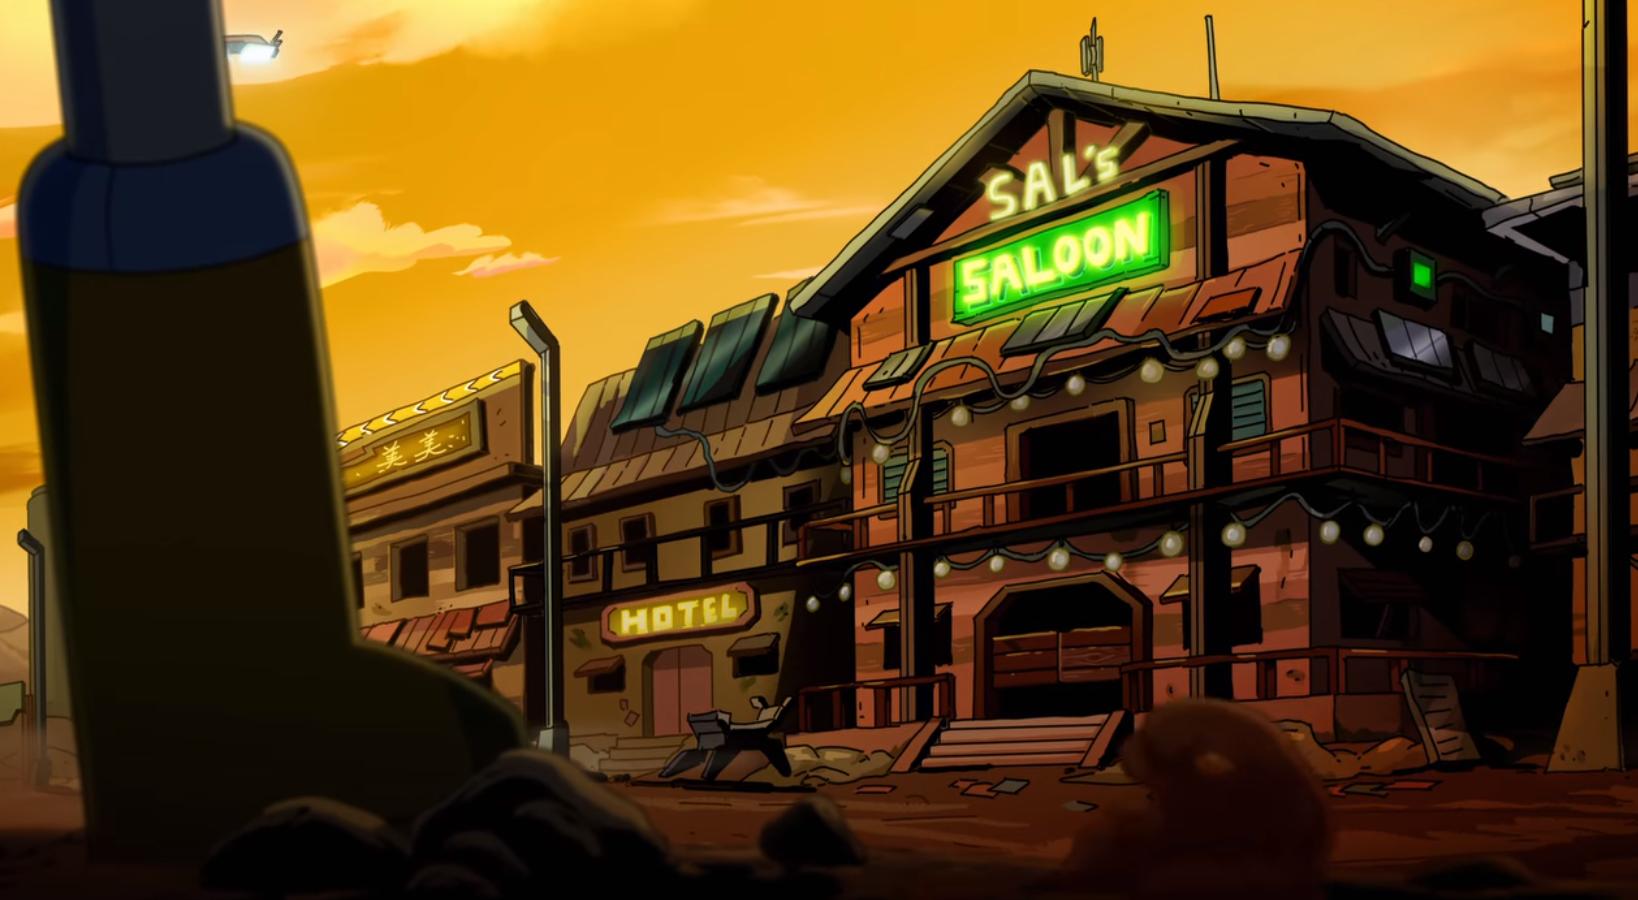 Sal's saloon